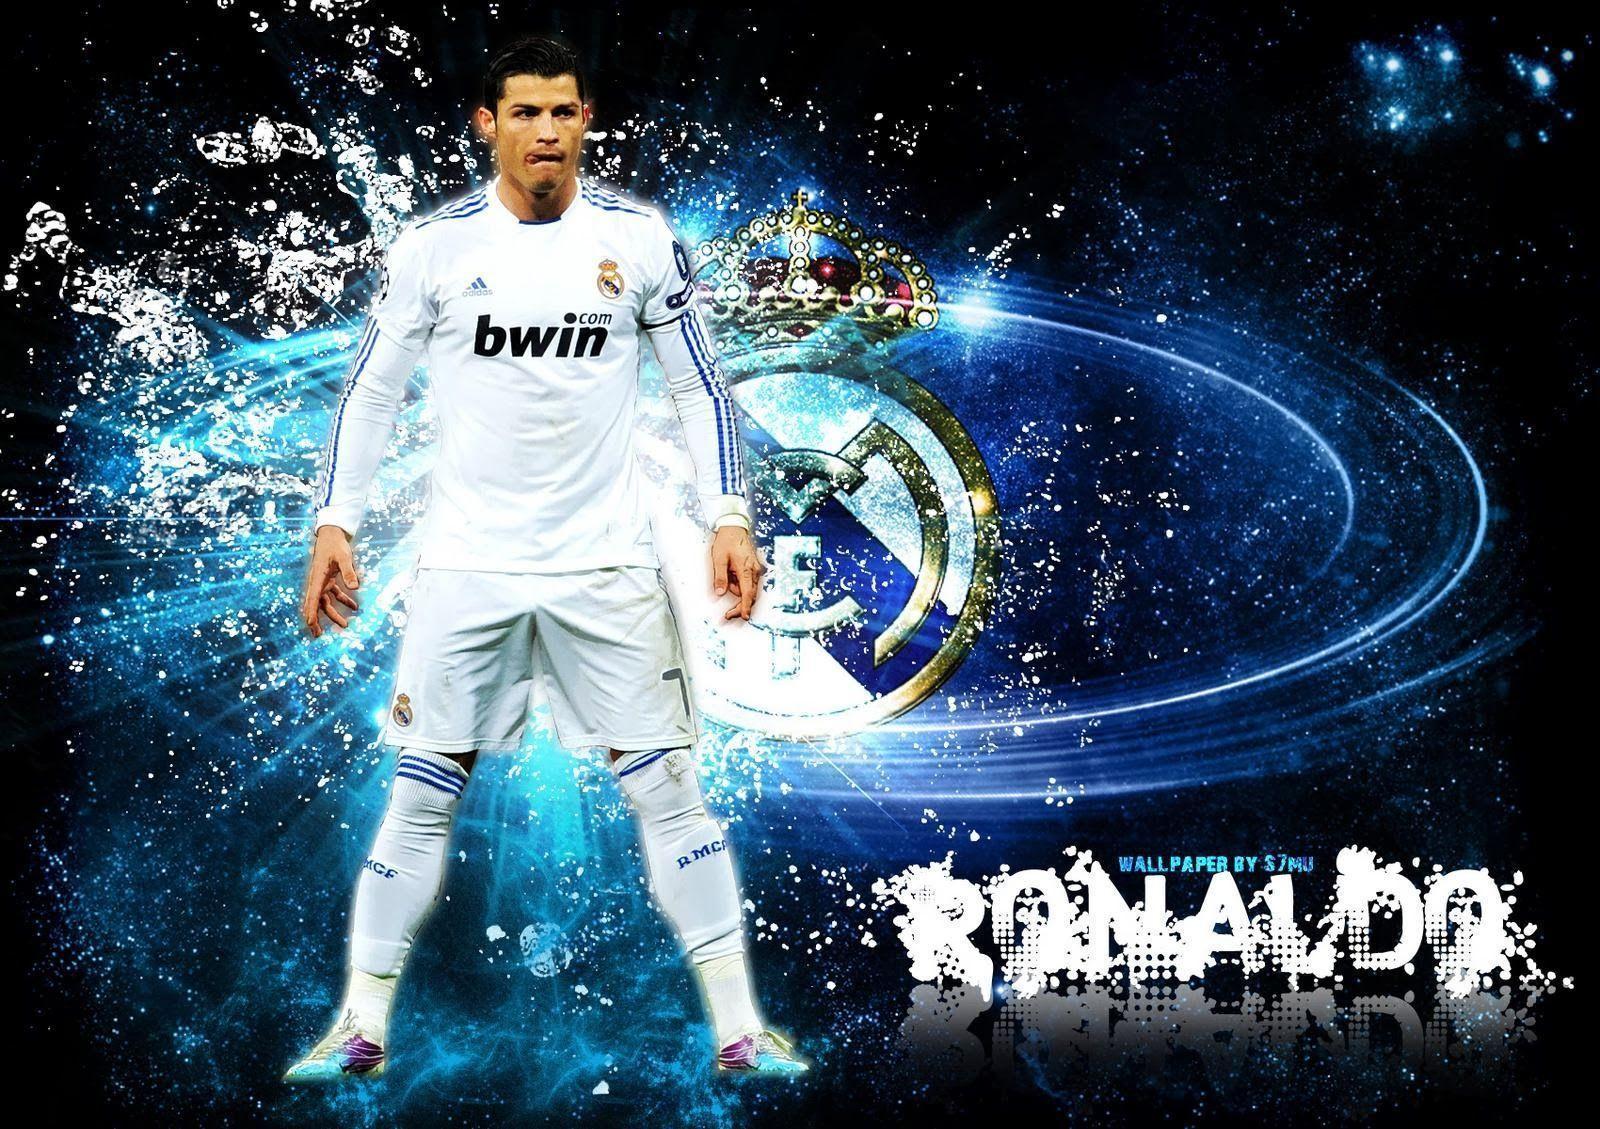 Cristiano Ronaldo 7 Wallpapers 2015 1600x1129